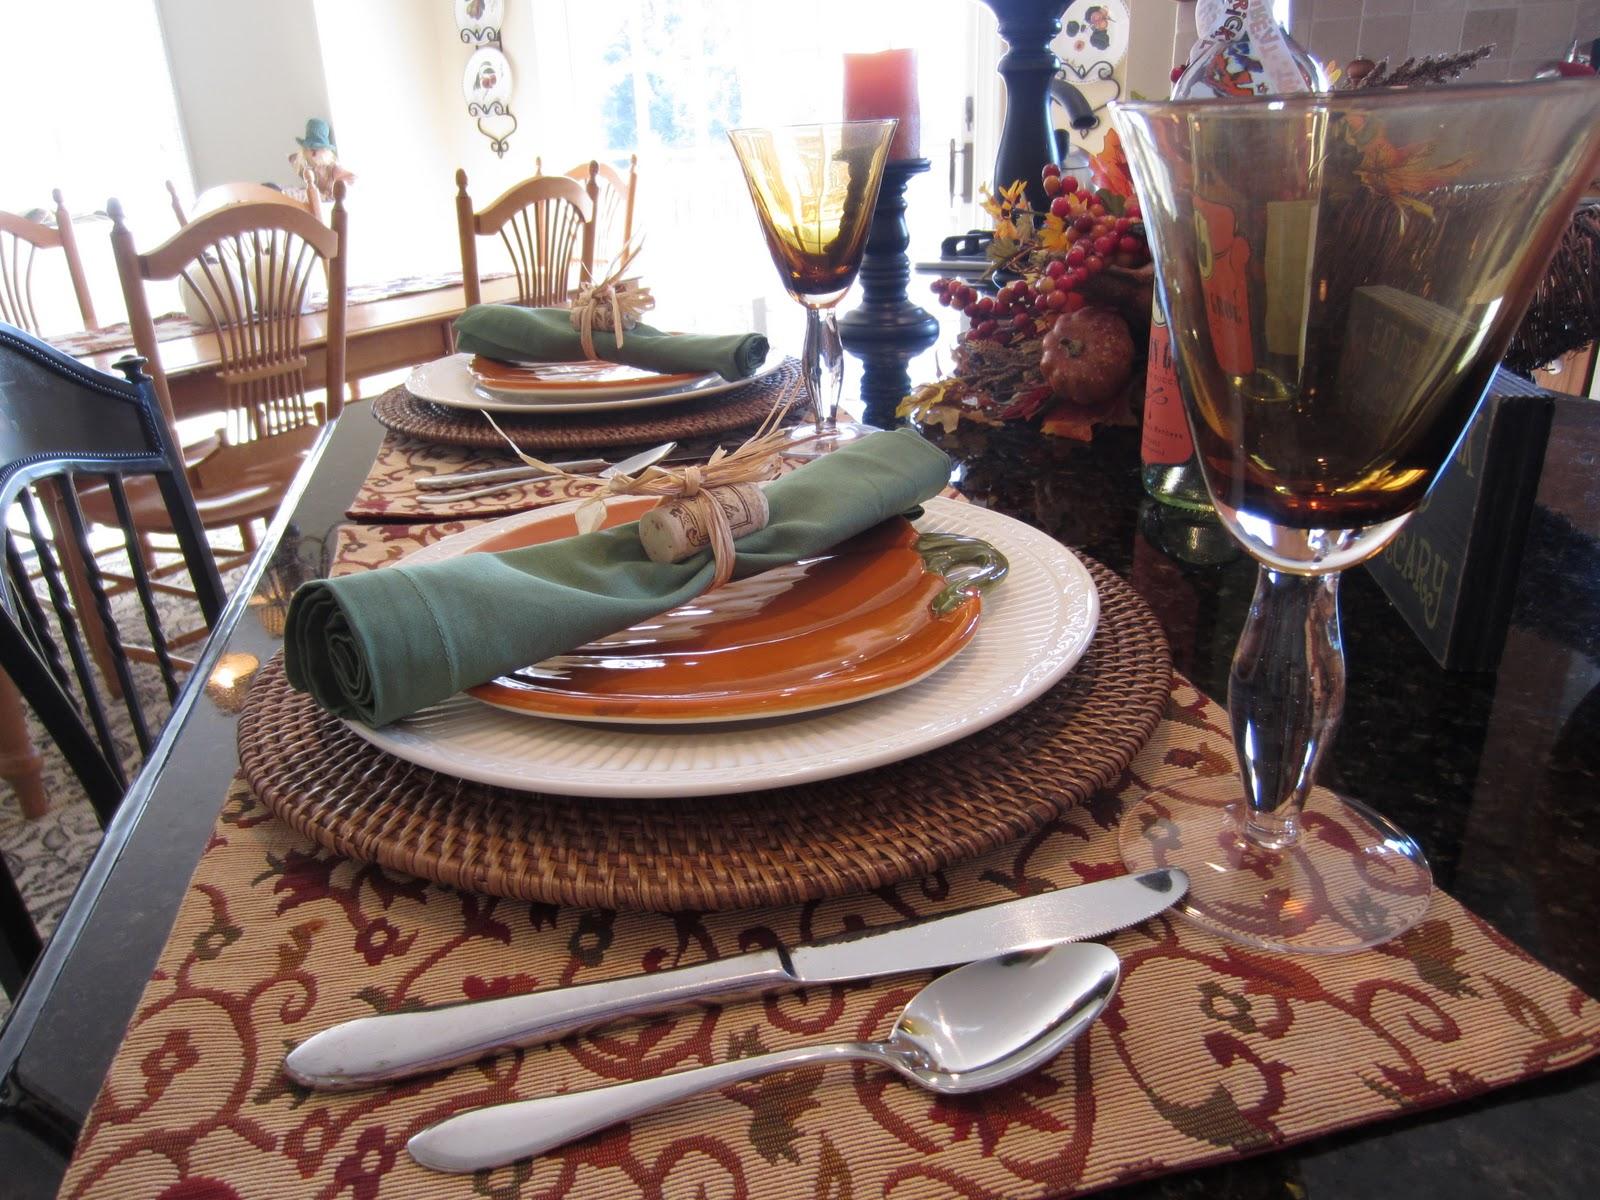 Halloween Table Setting - Fall colors and pumpkin plates make the table festive for the season.